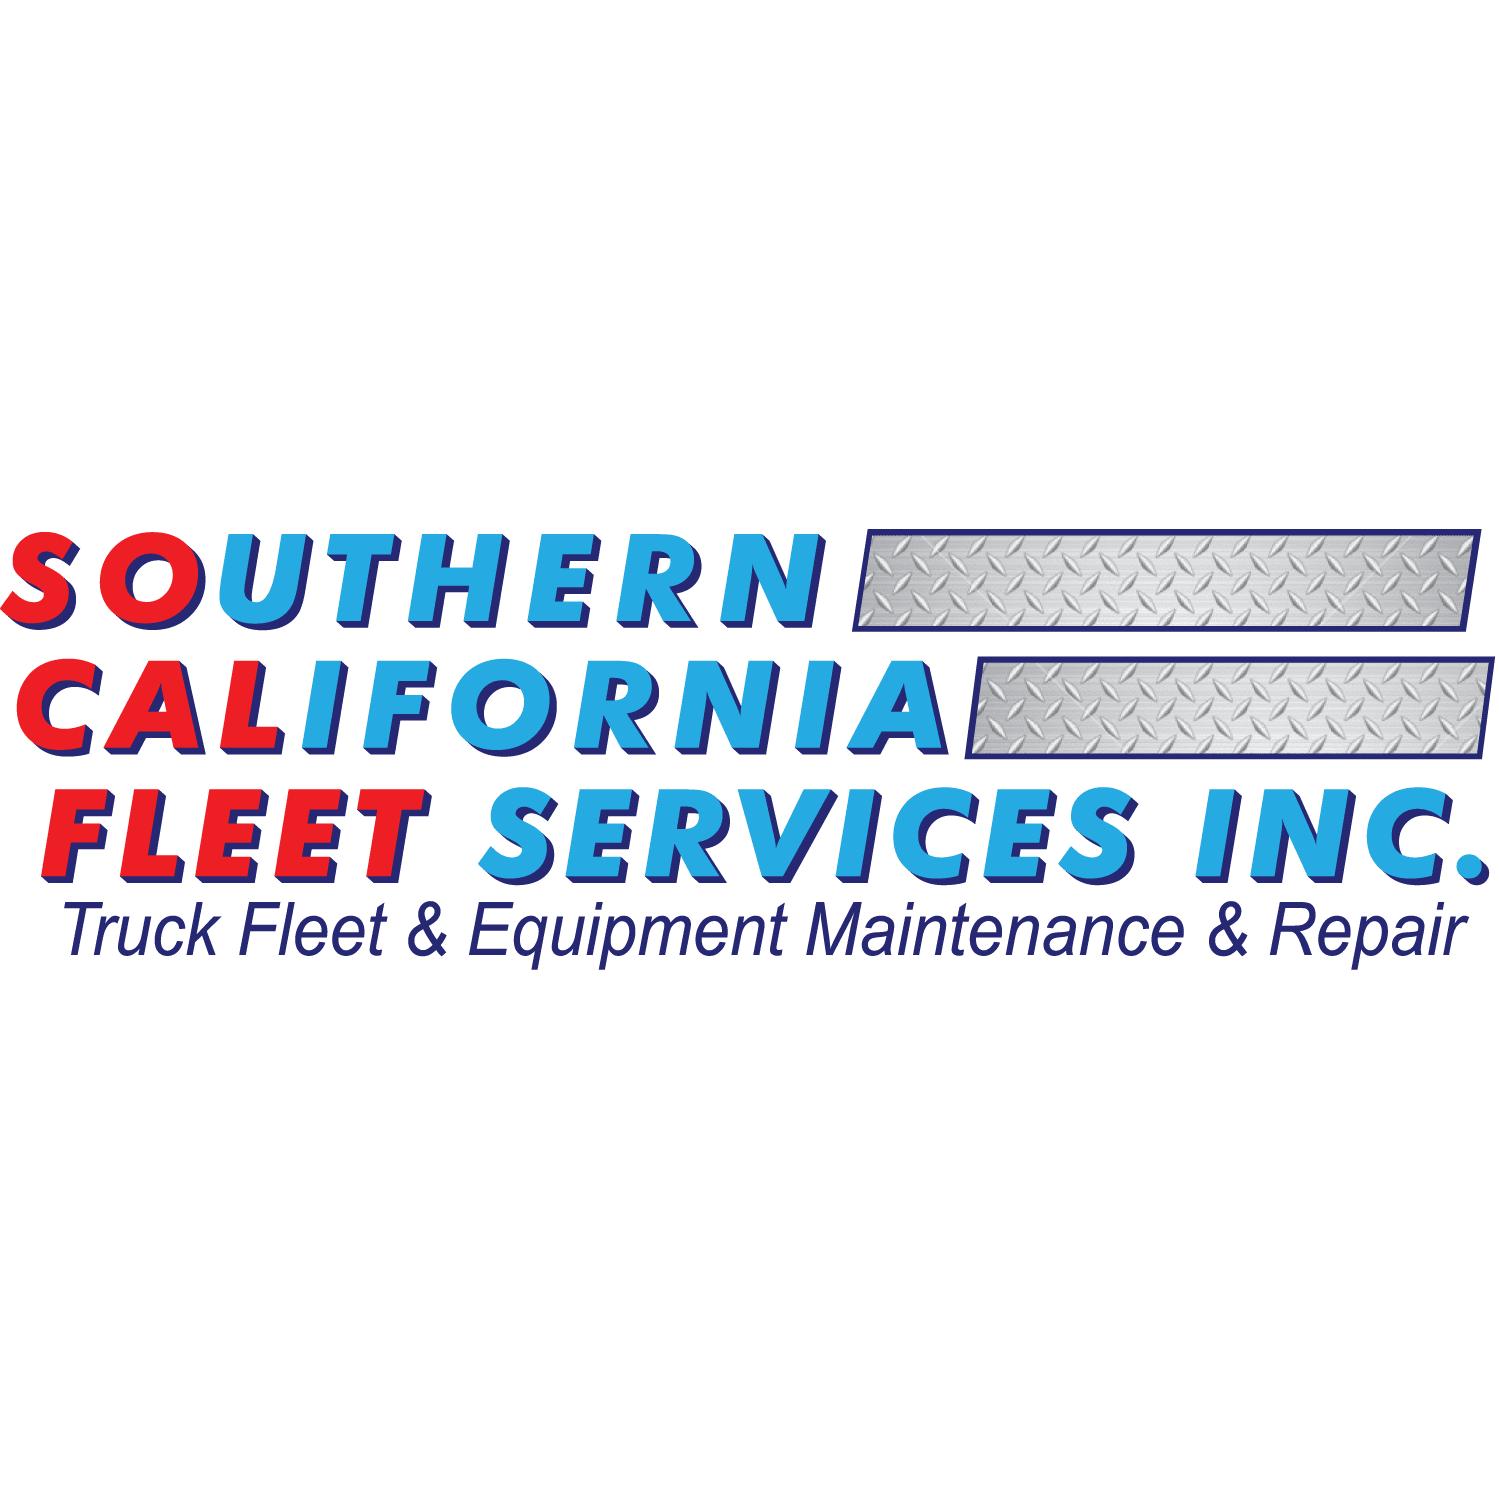 Southern California Fleet Services INC.